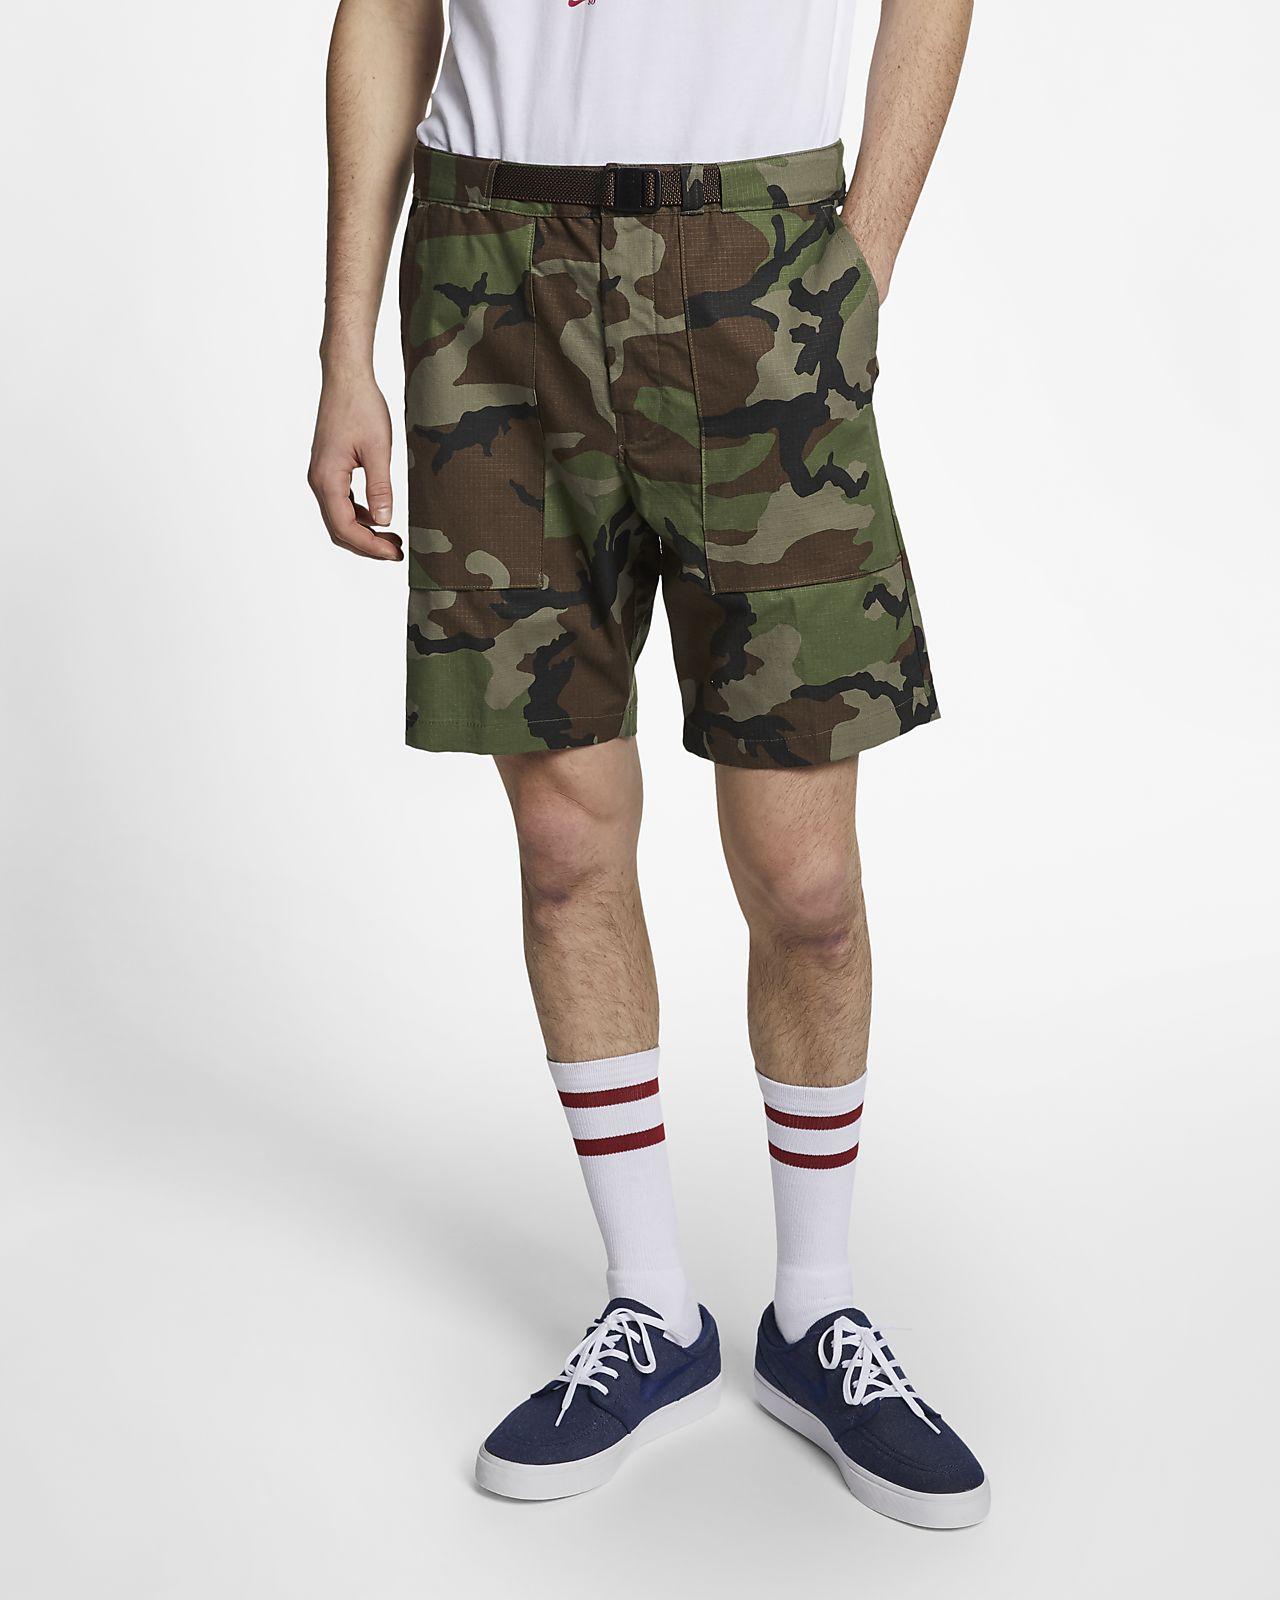 Short de skateboard camouflage Nike SB pour Homme